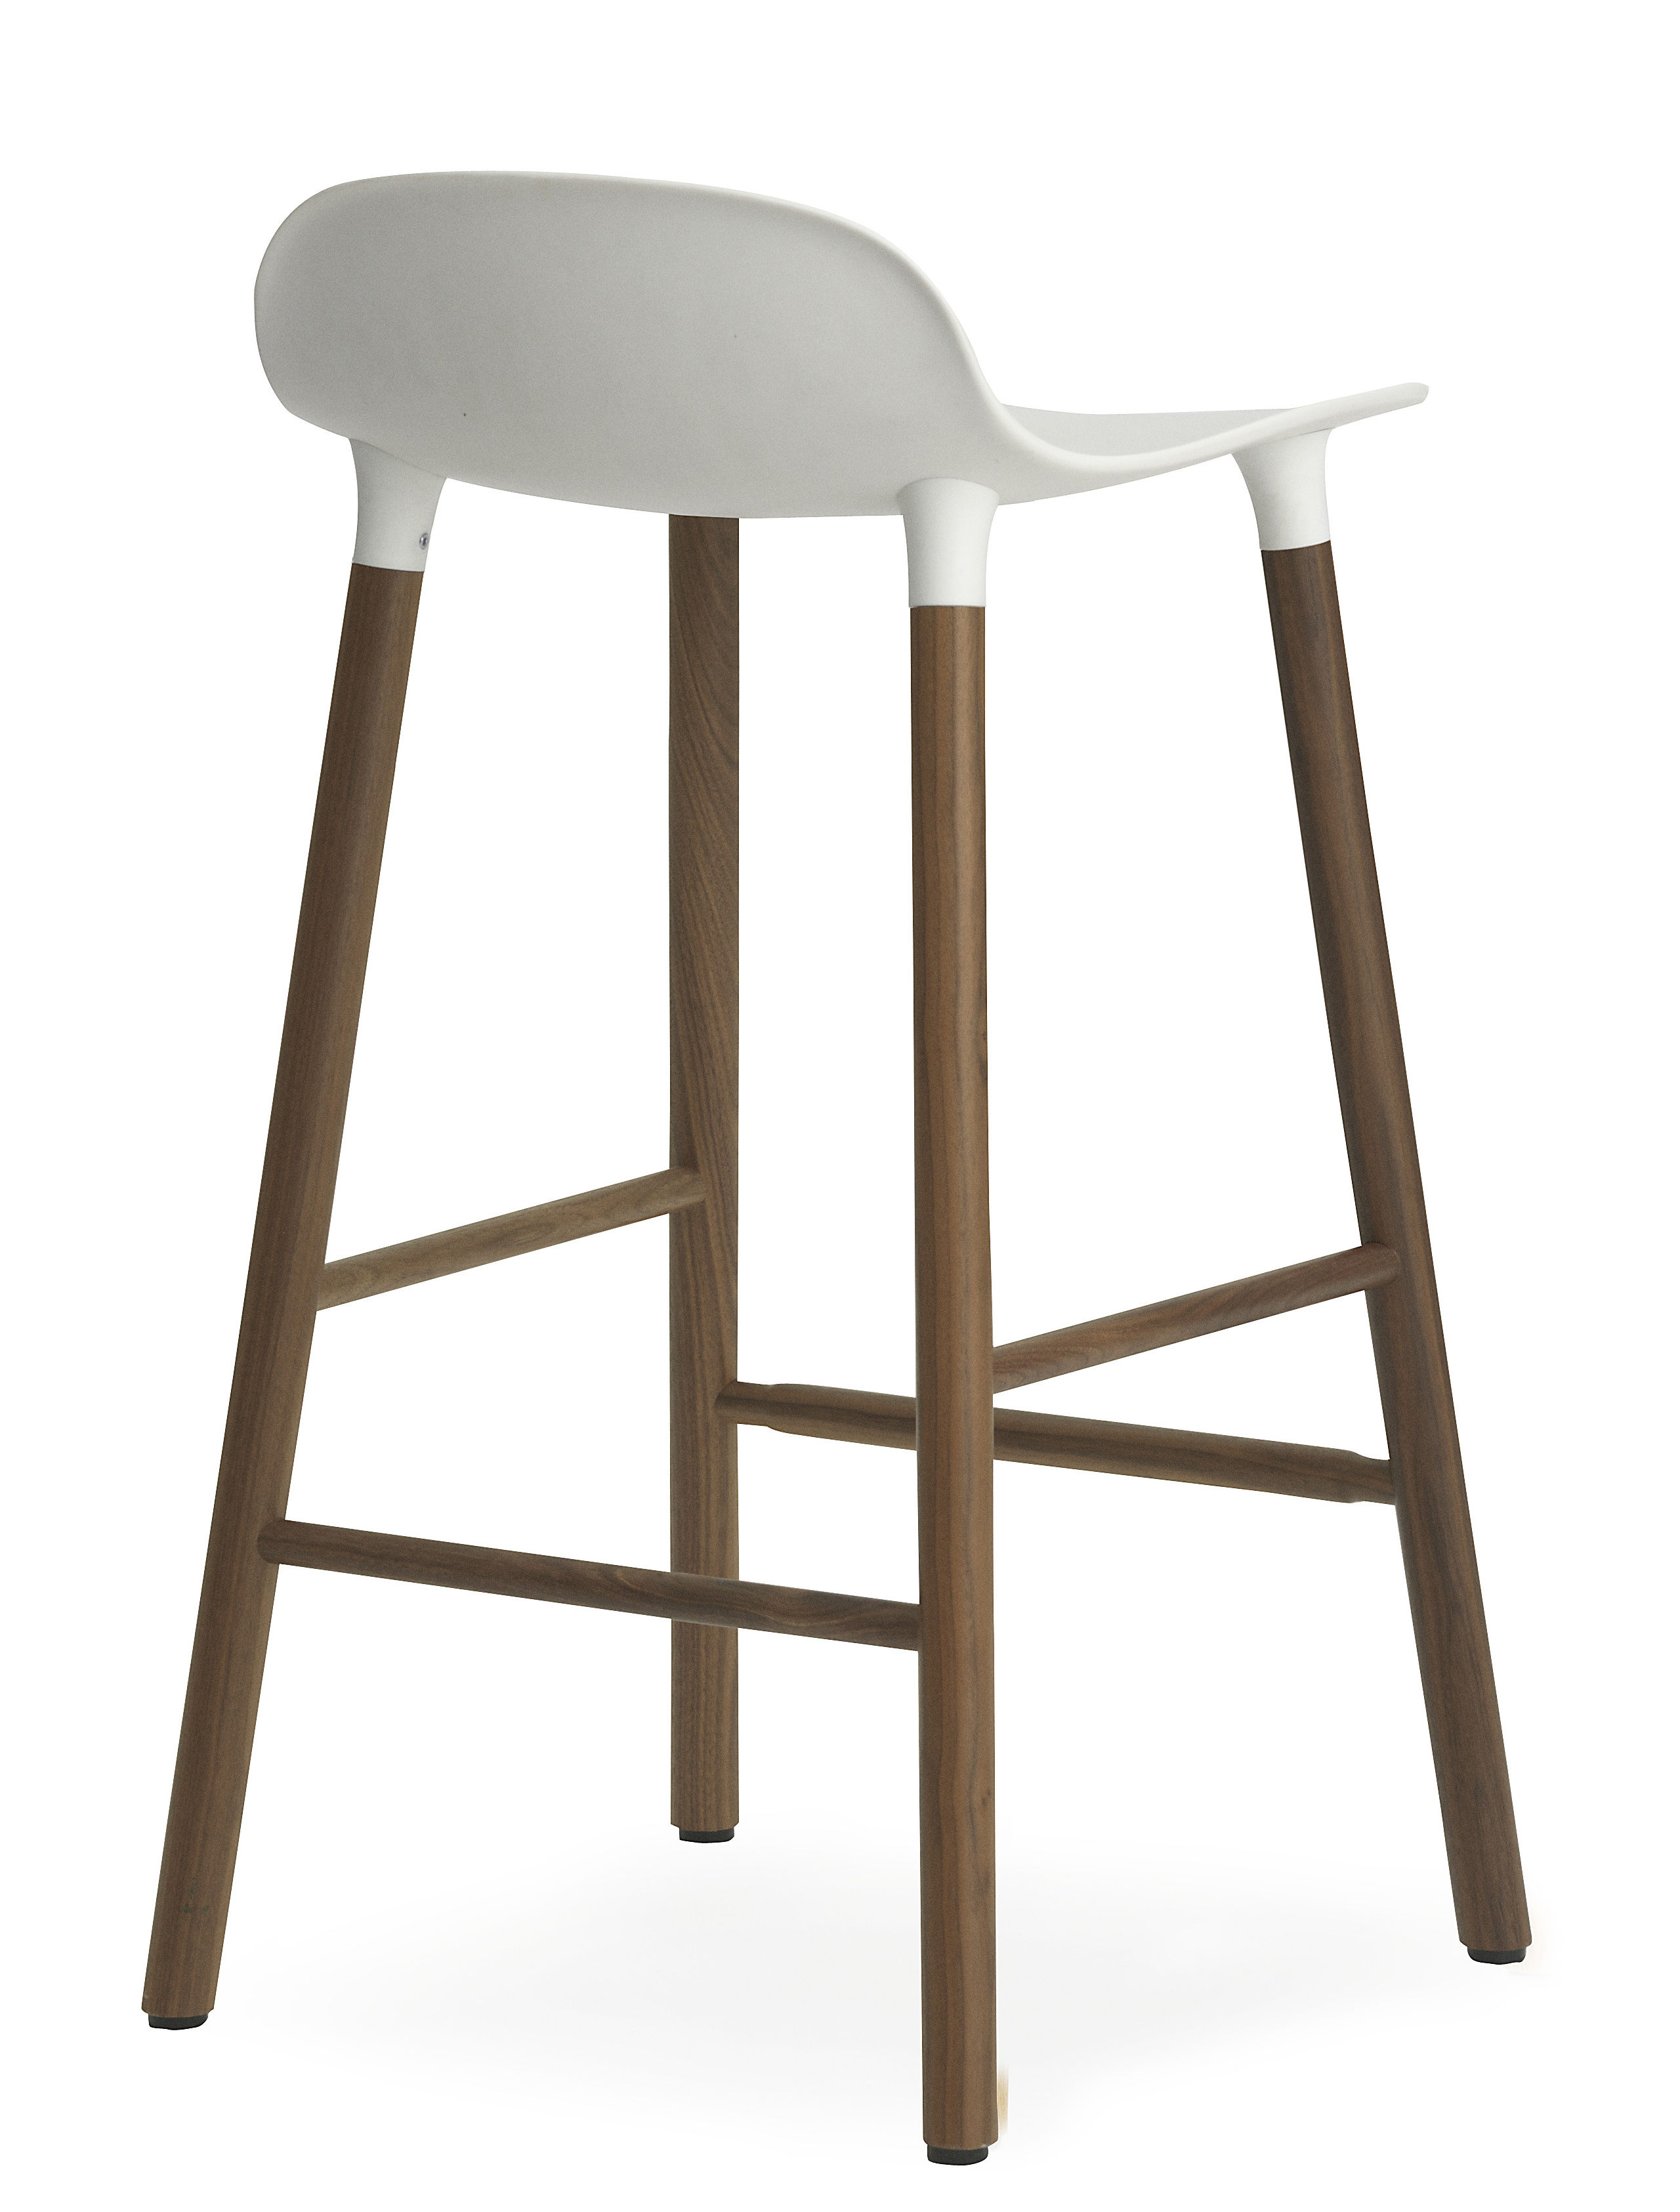 form bar stool h 65 cm walnut leg white walnut by. Black Bedroom Furniture Sets. Home Design Ideas